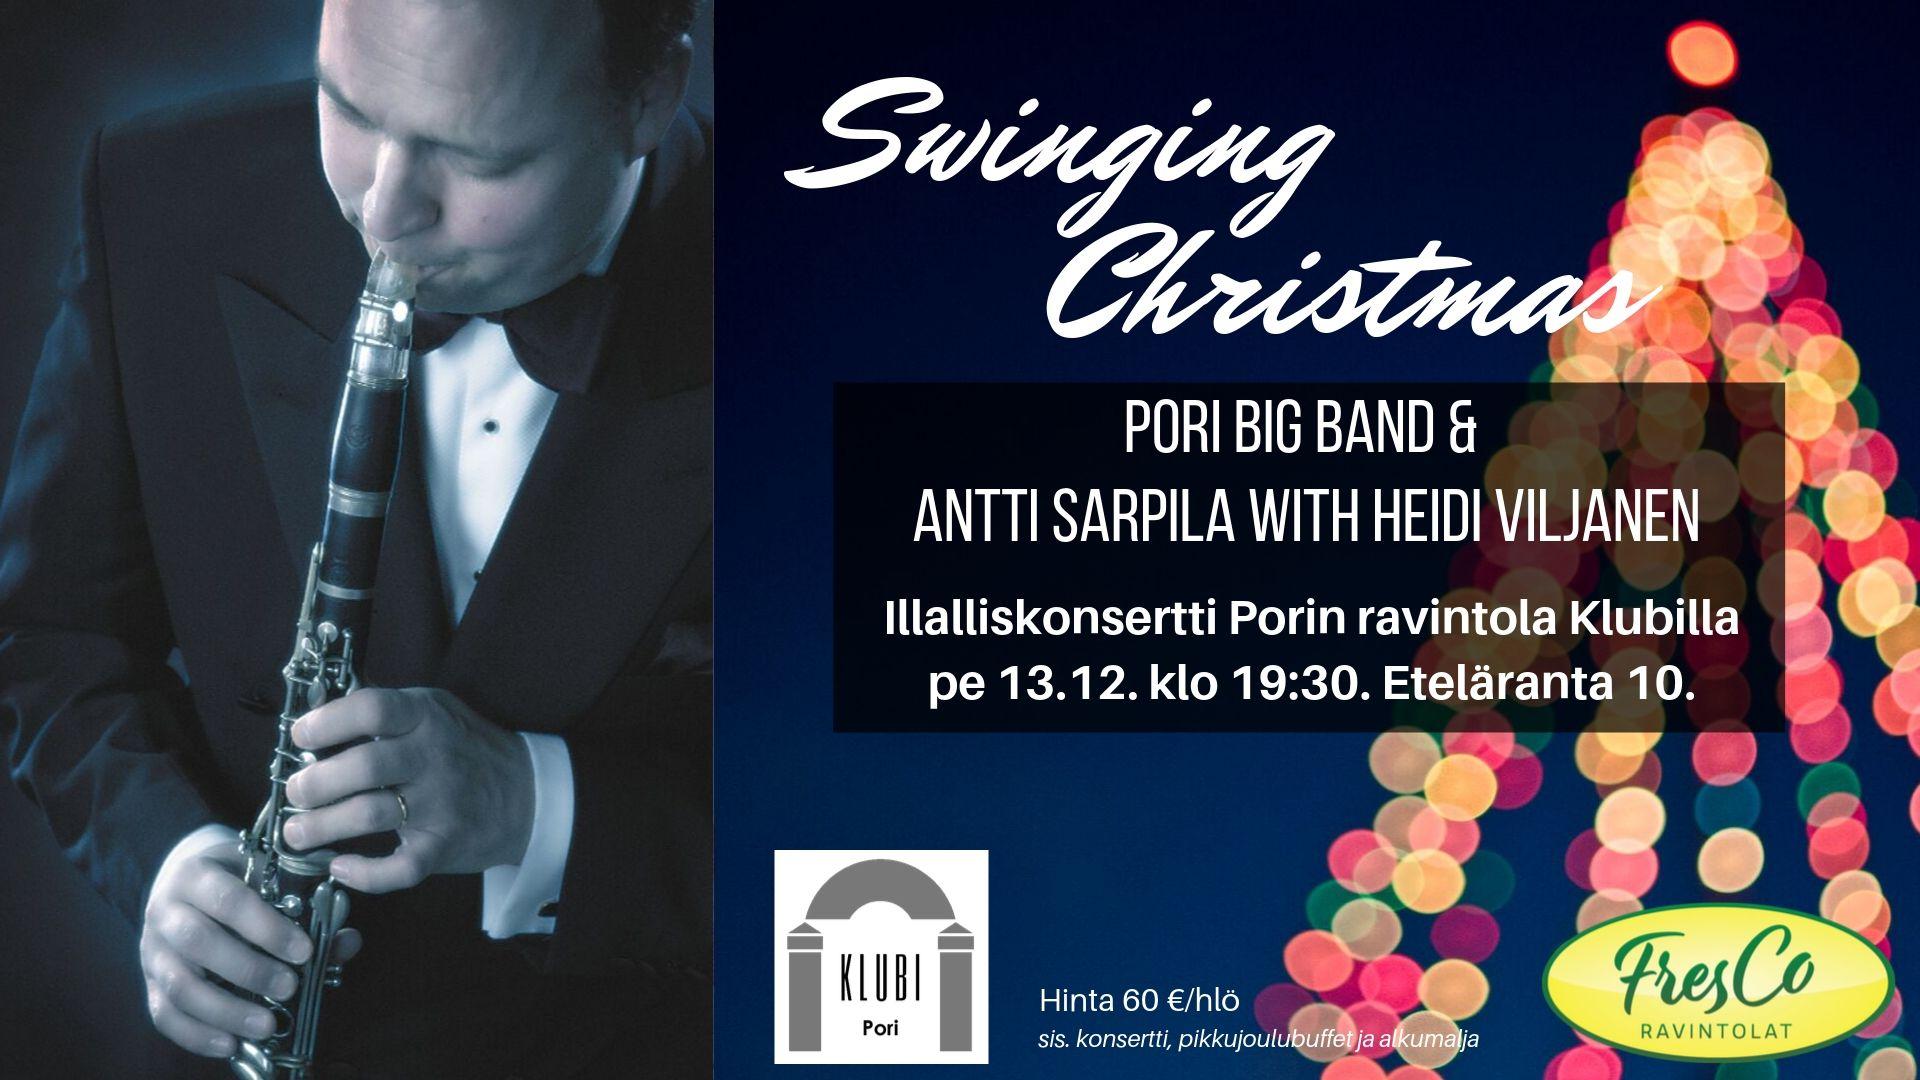 Illalliskonsertti: Swinging Christmas – Pori Big Band & Antti Sarpila with special guest Heidi Viljanen